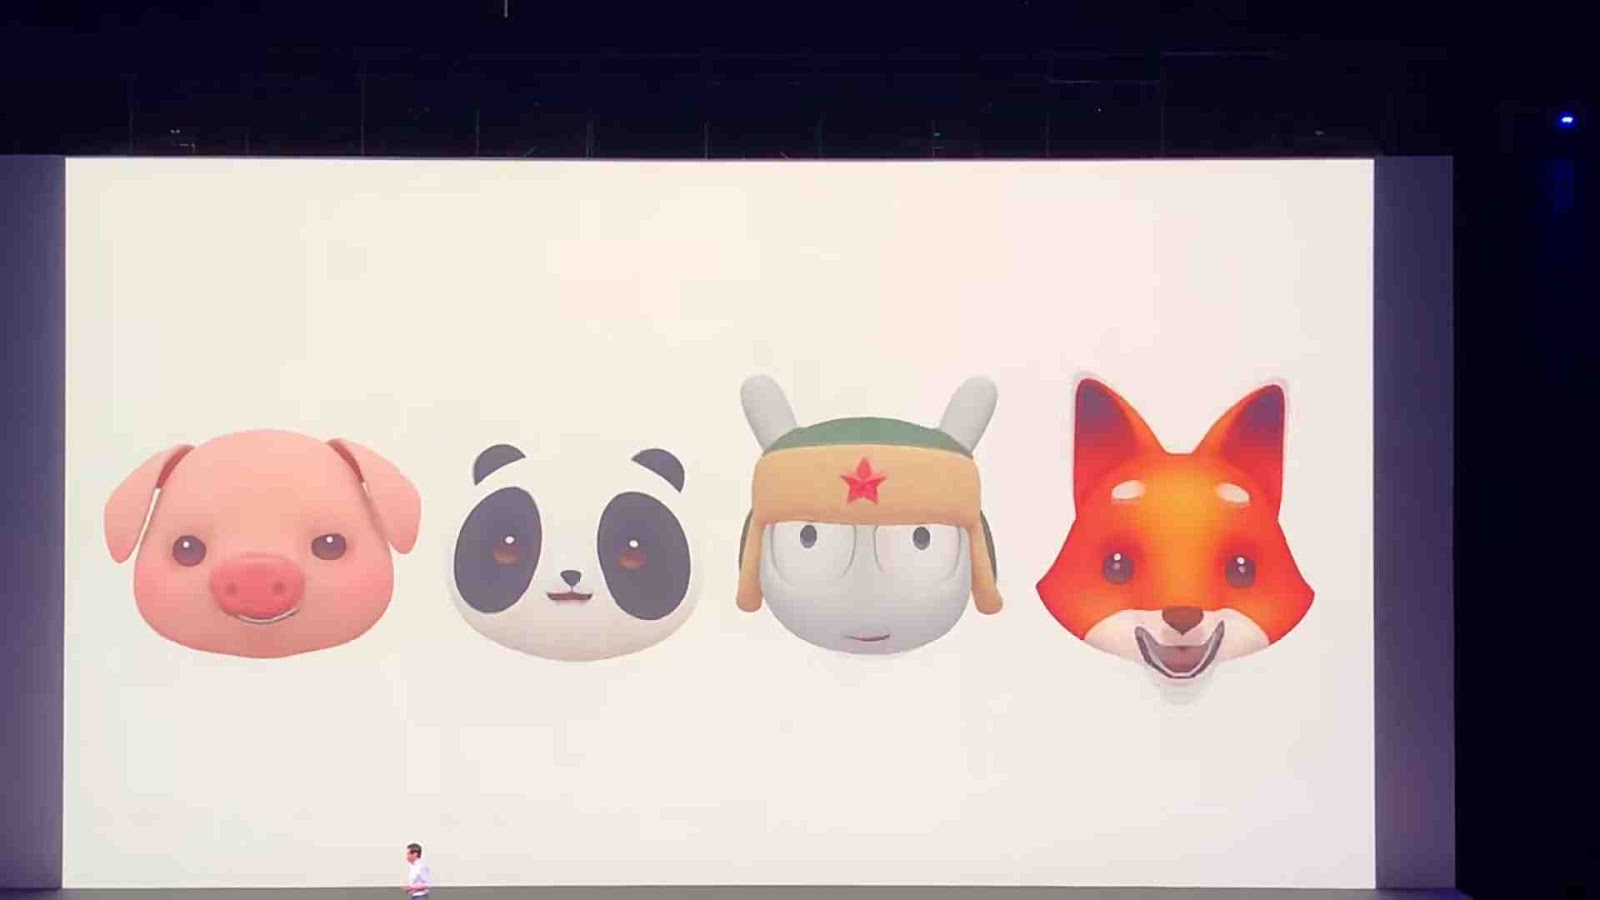 Xiaomi's 3D Animoji